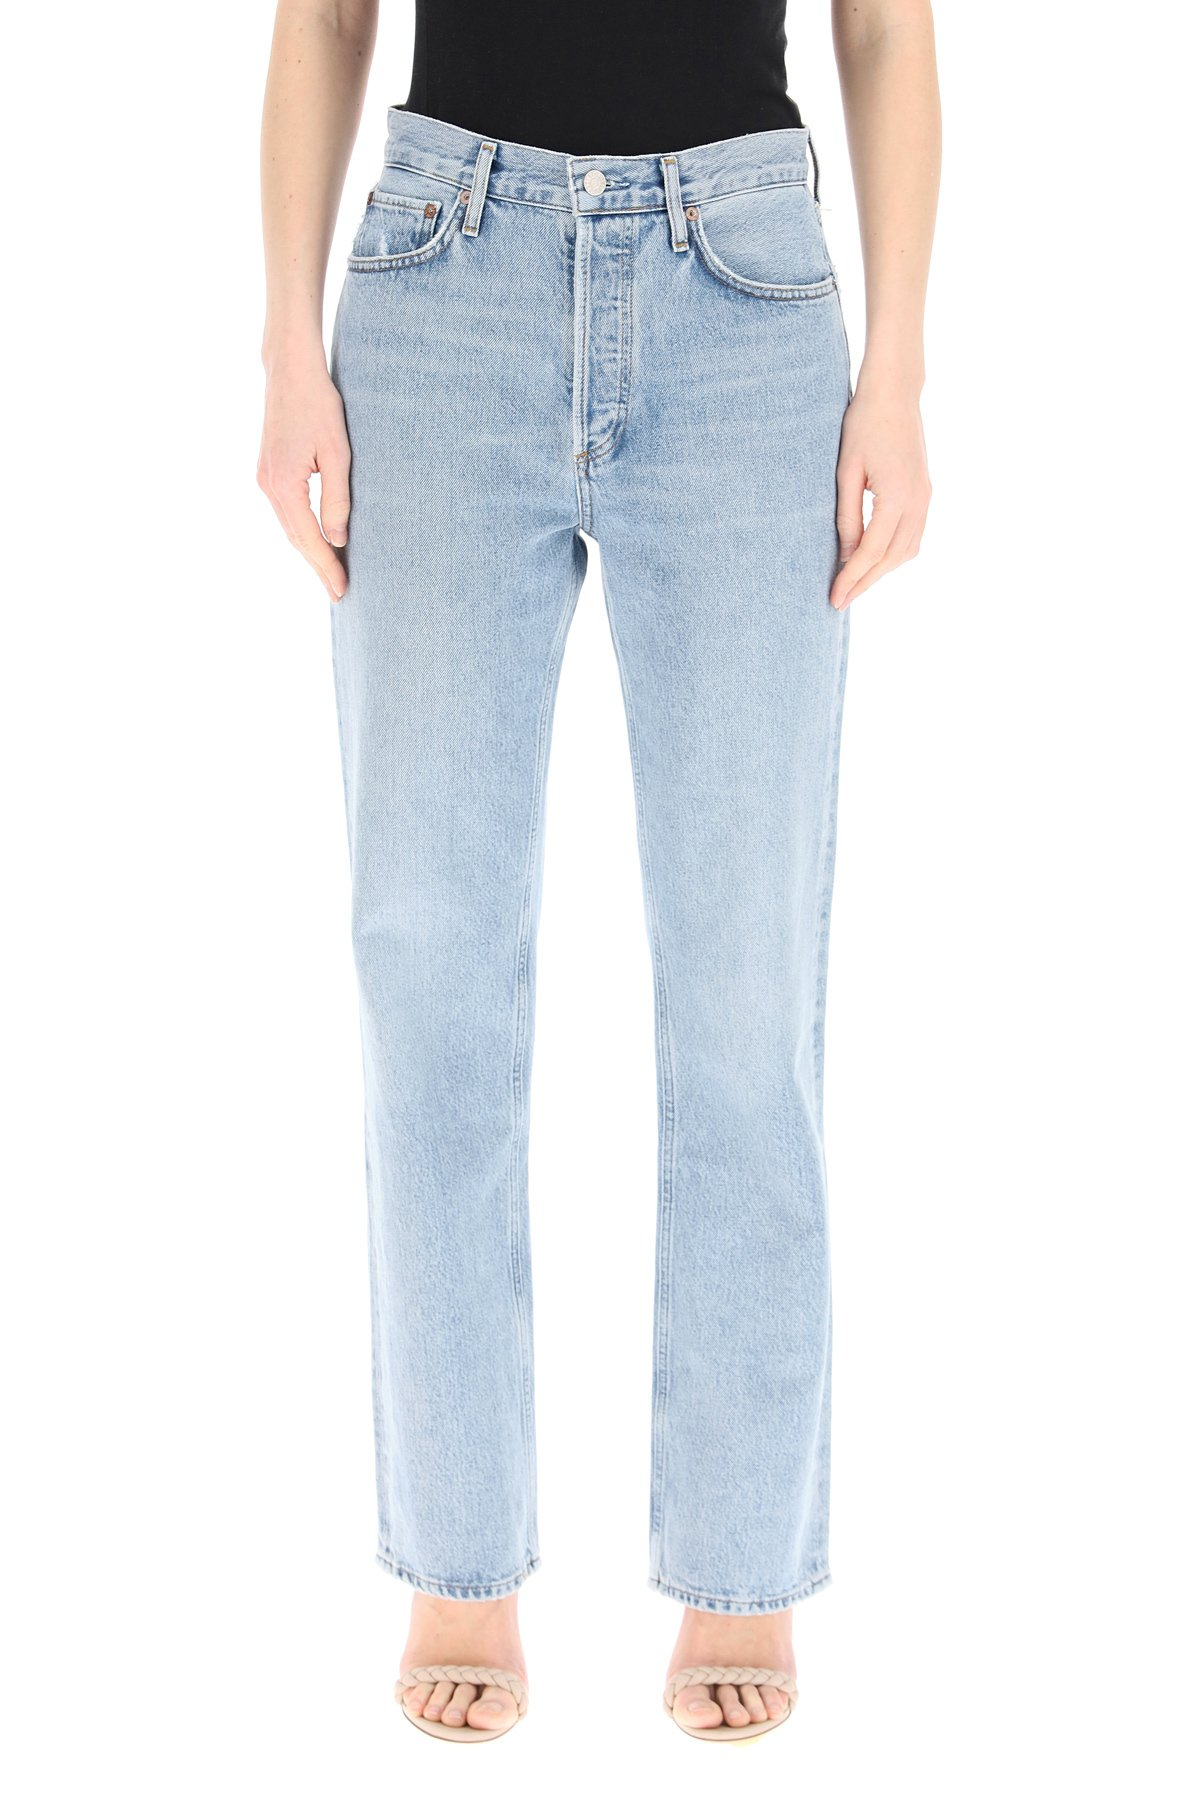 Agolde jeans lana